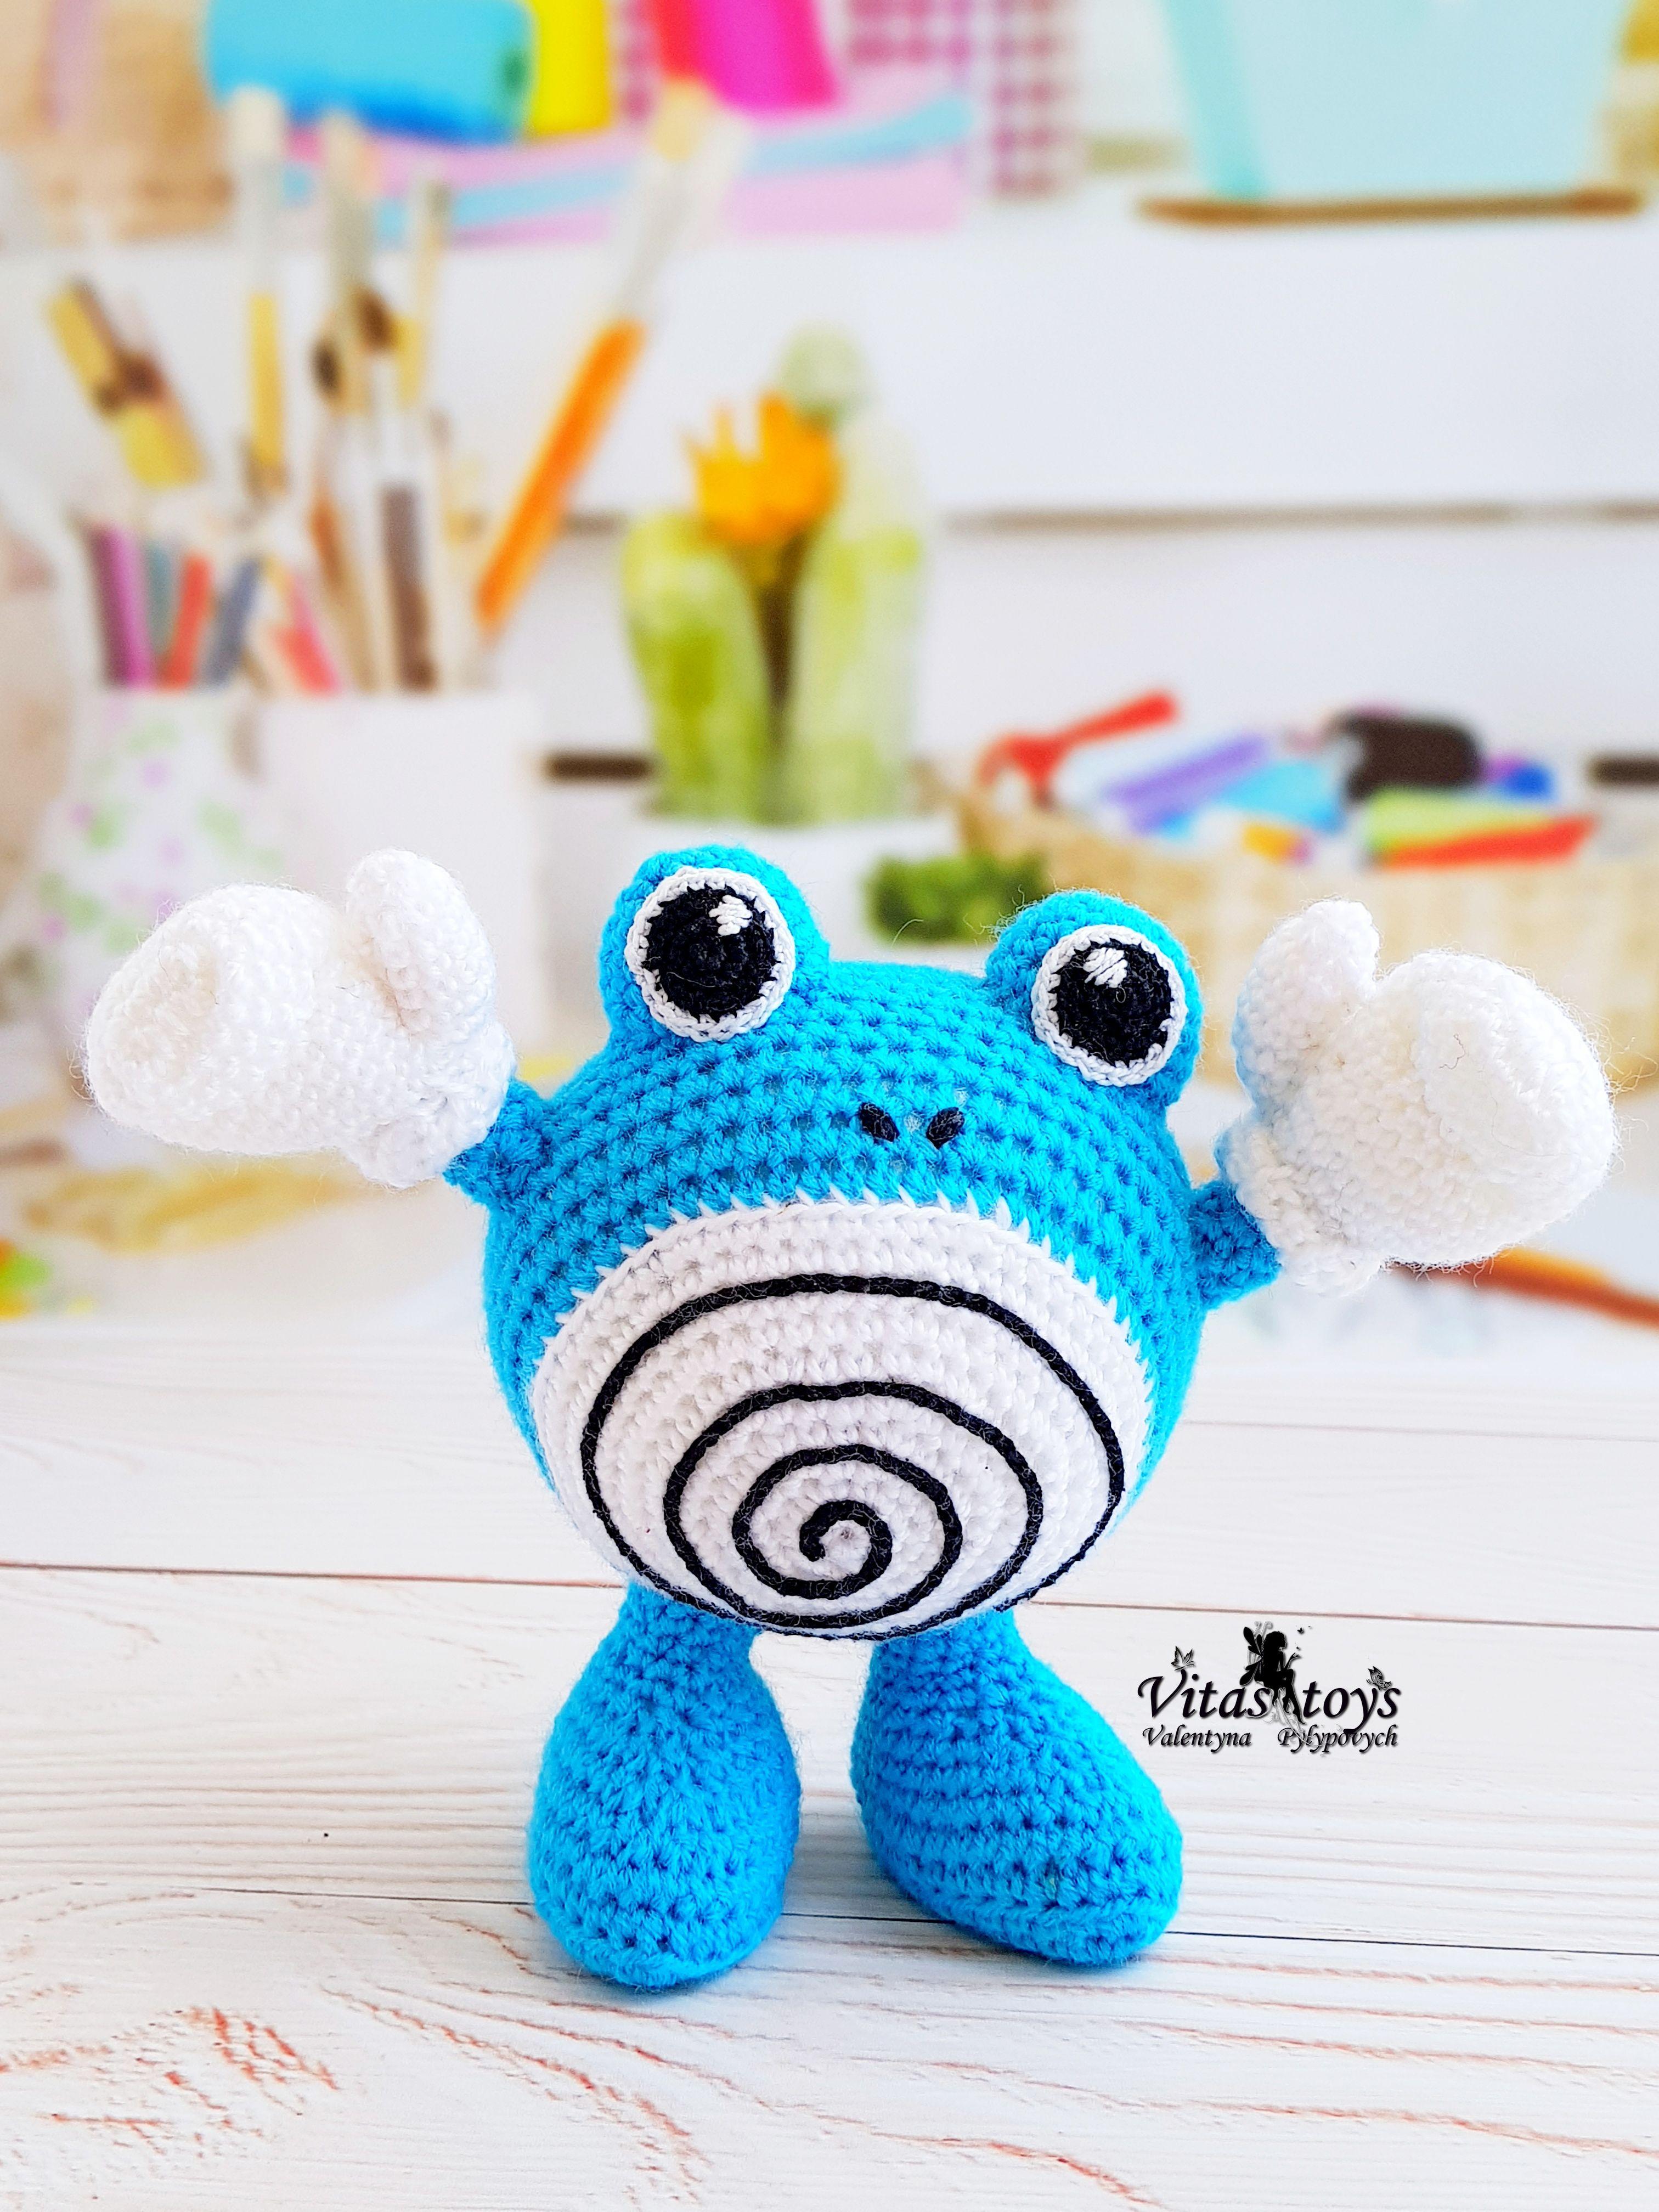 Pokemon crotchet doll | Pokemon crochet pattern, Crochet pokemon ... | 4032x3024